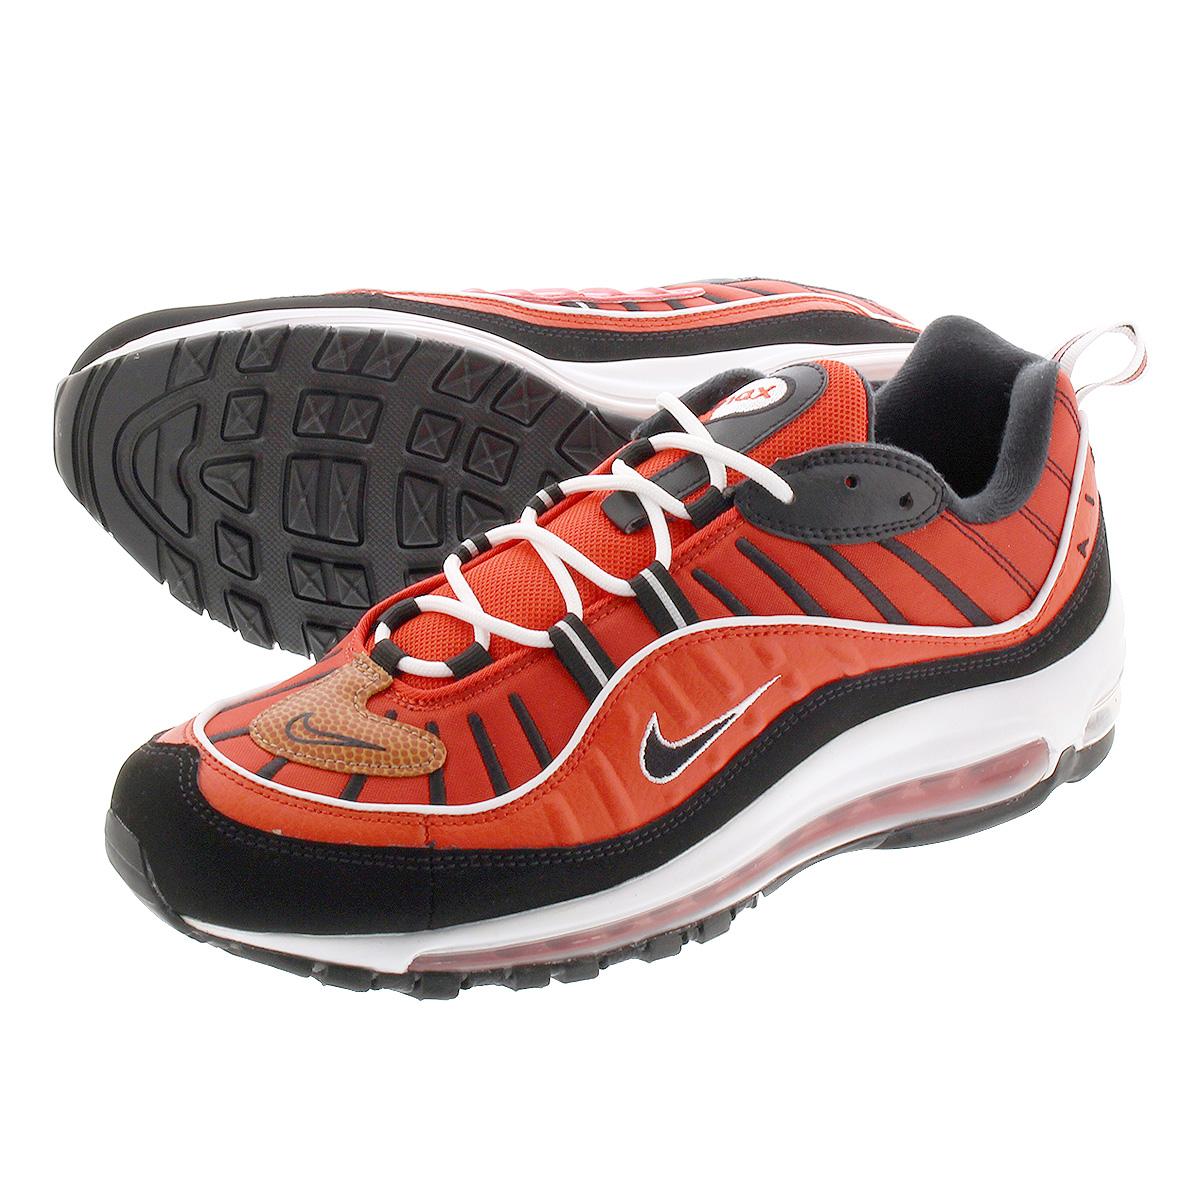 640744 604 Nike Air Max 98 Habanero Rot Schwarz